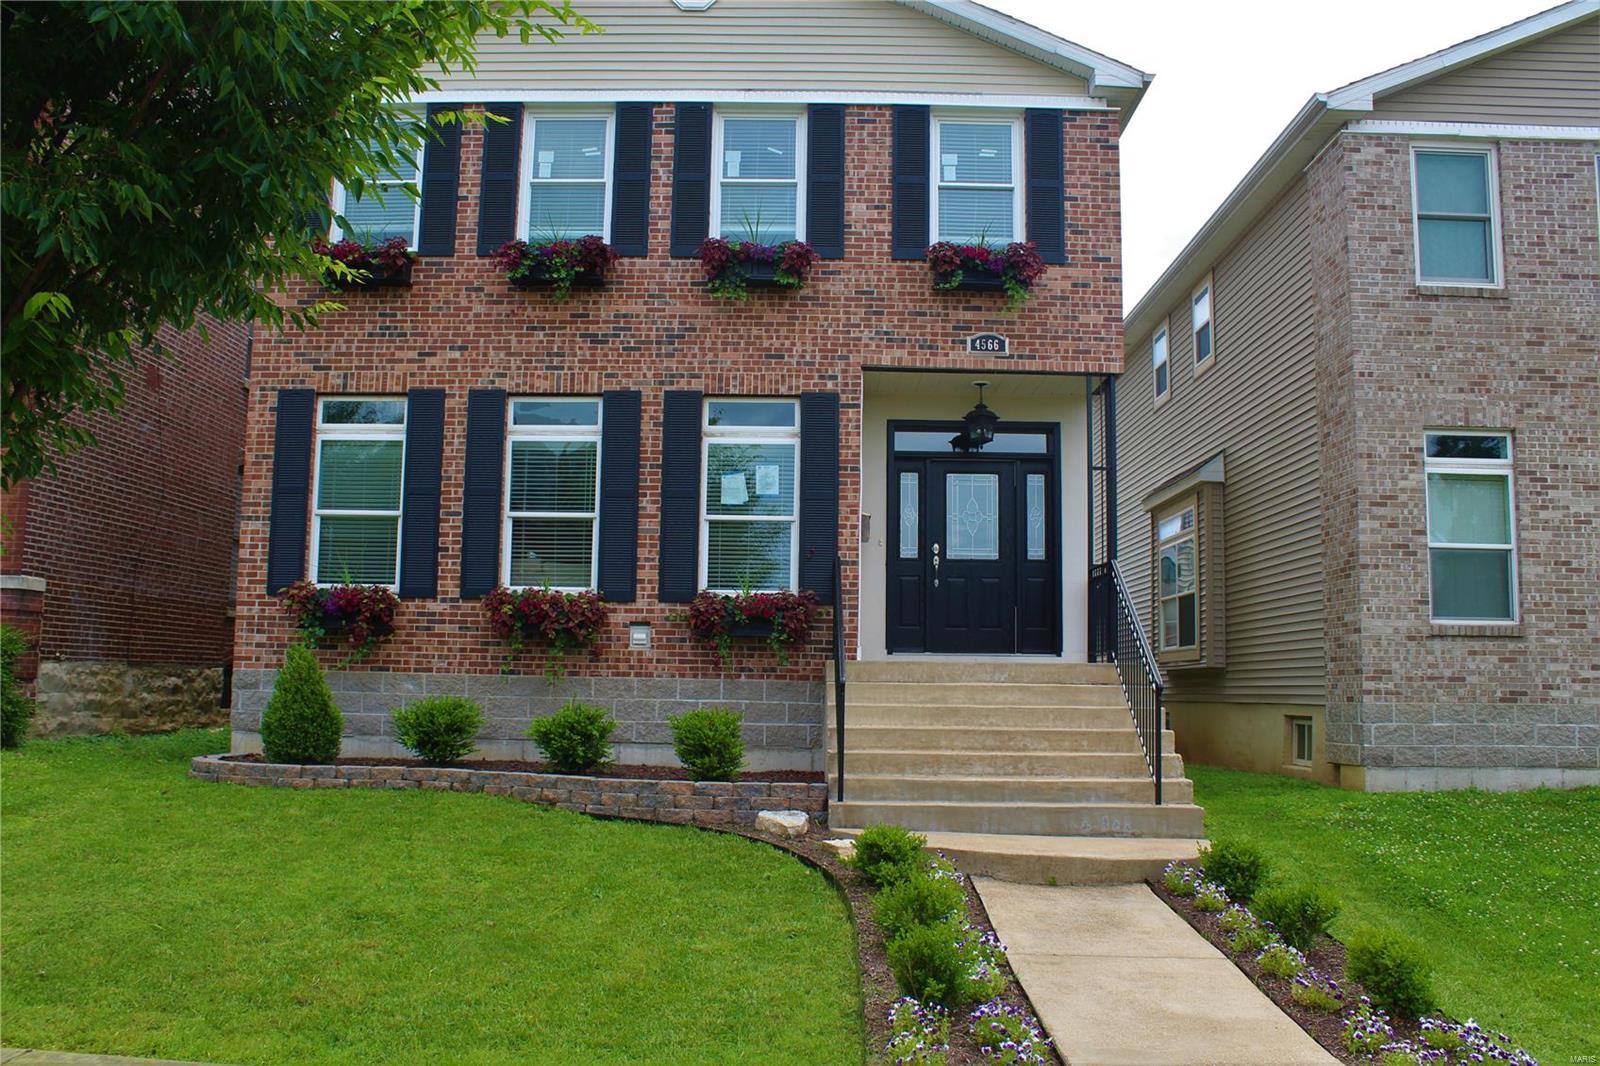 4566 & 4600 Washington Real Estate Listings Main Image